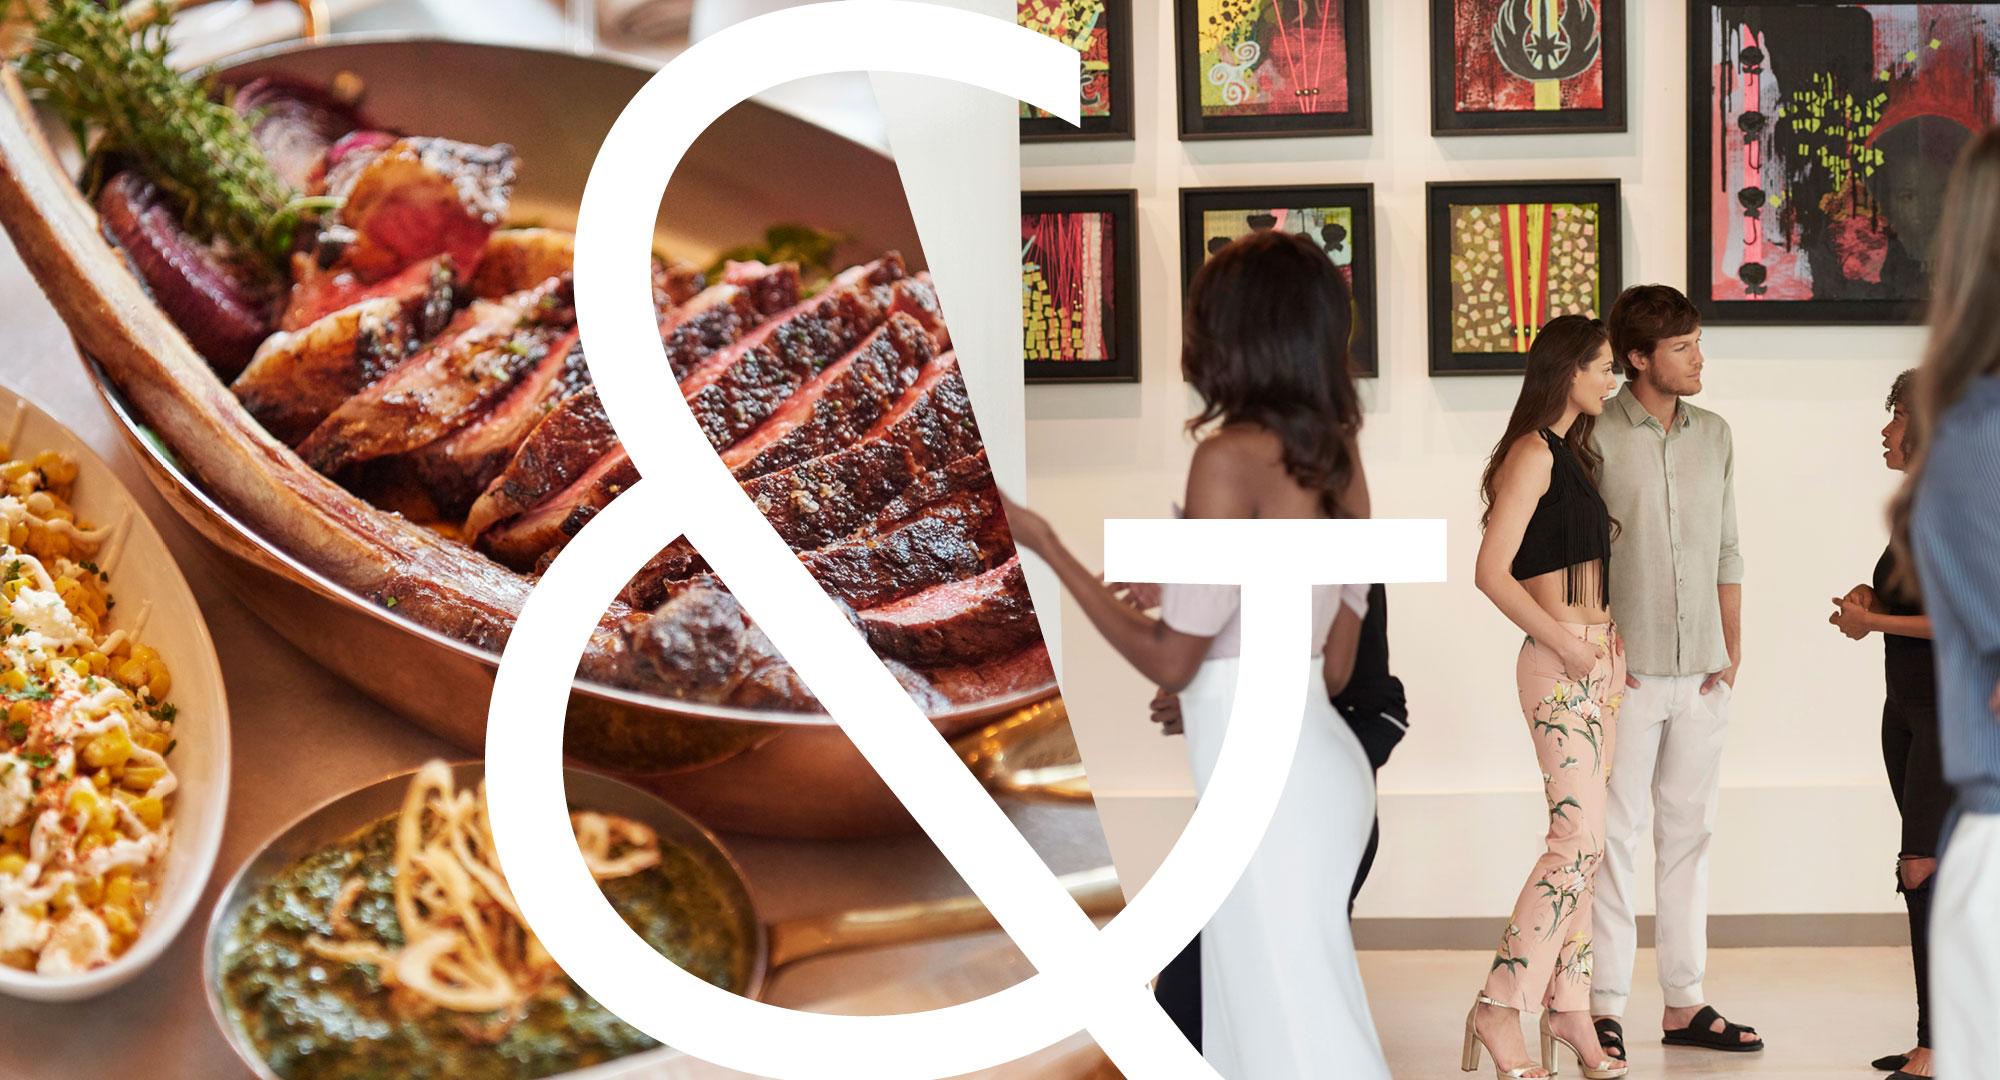 Culinary & Arts Festival